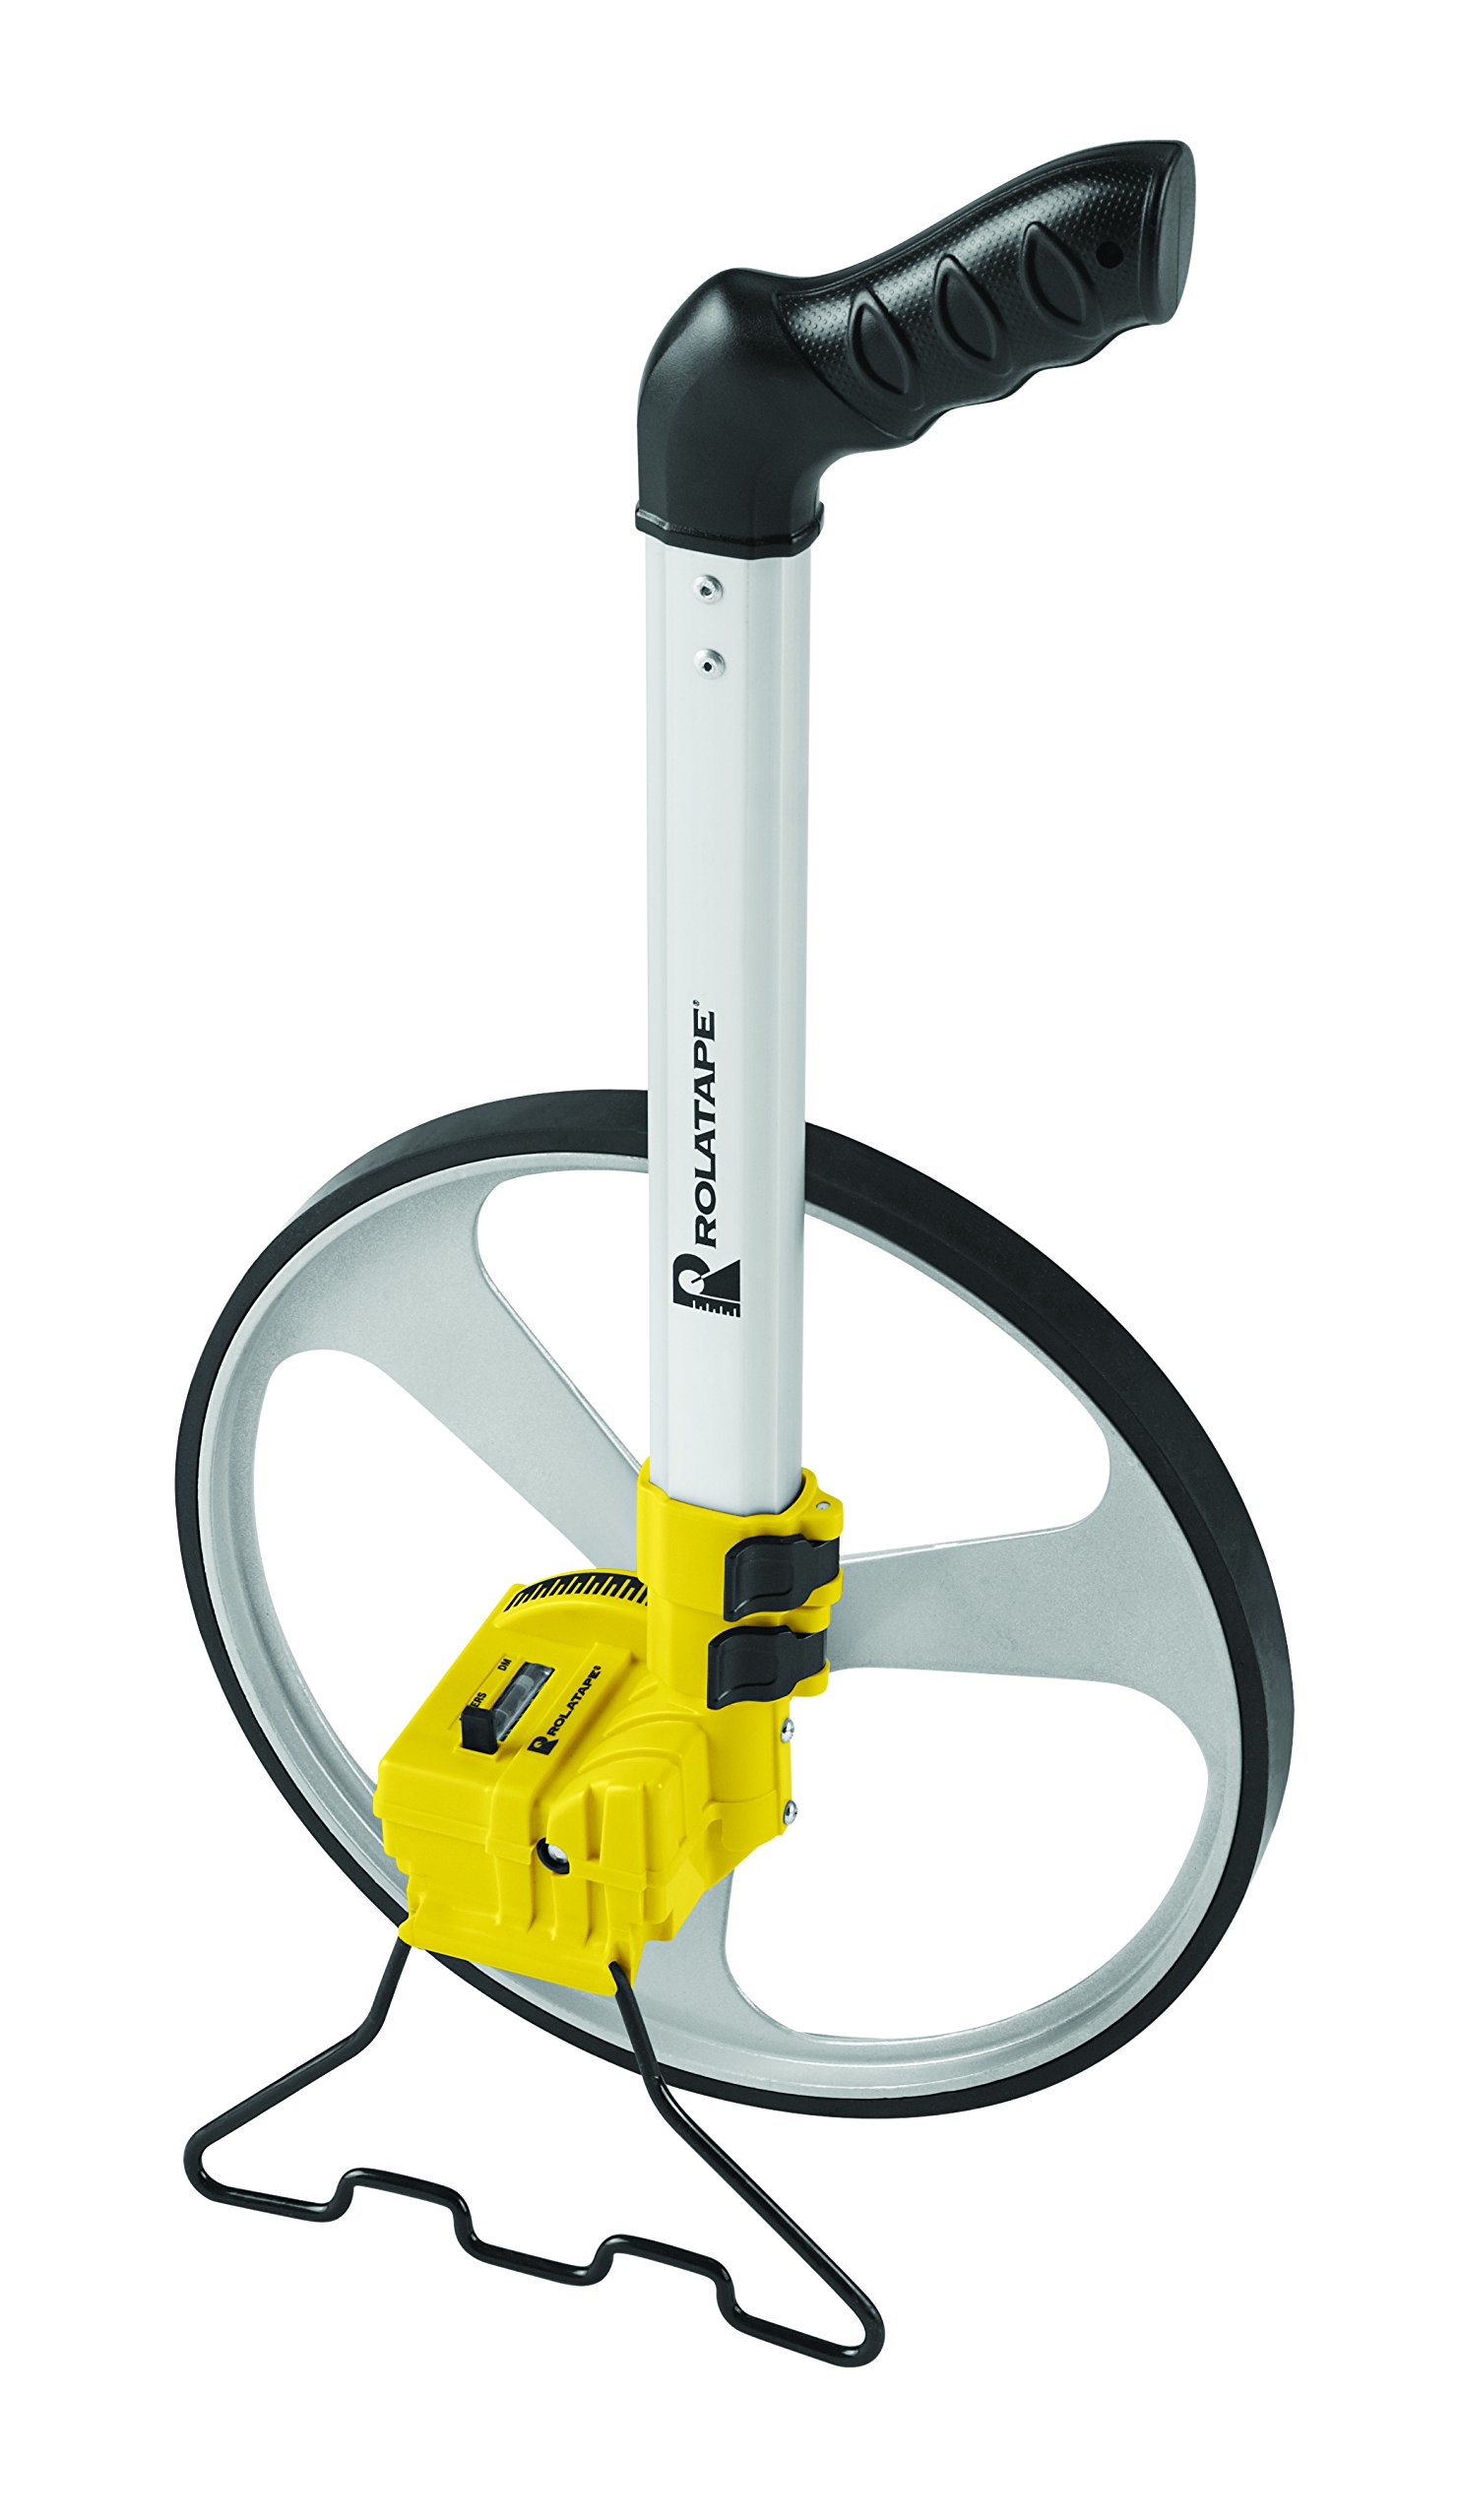 Rolatape RT312M 11-1/4-Inch Single Measuring Wheel Metric